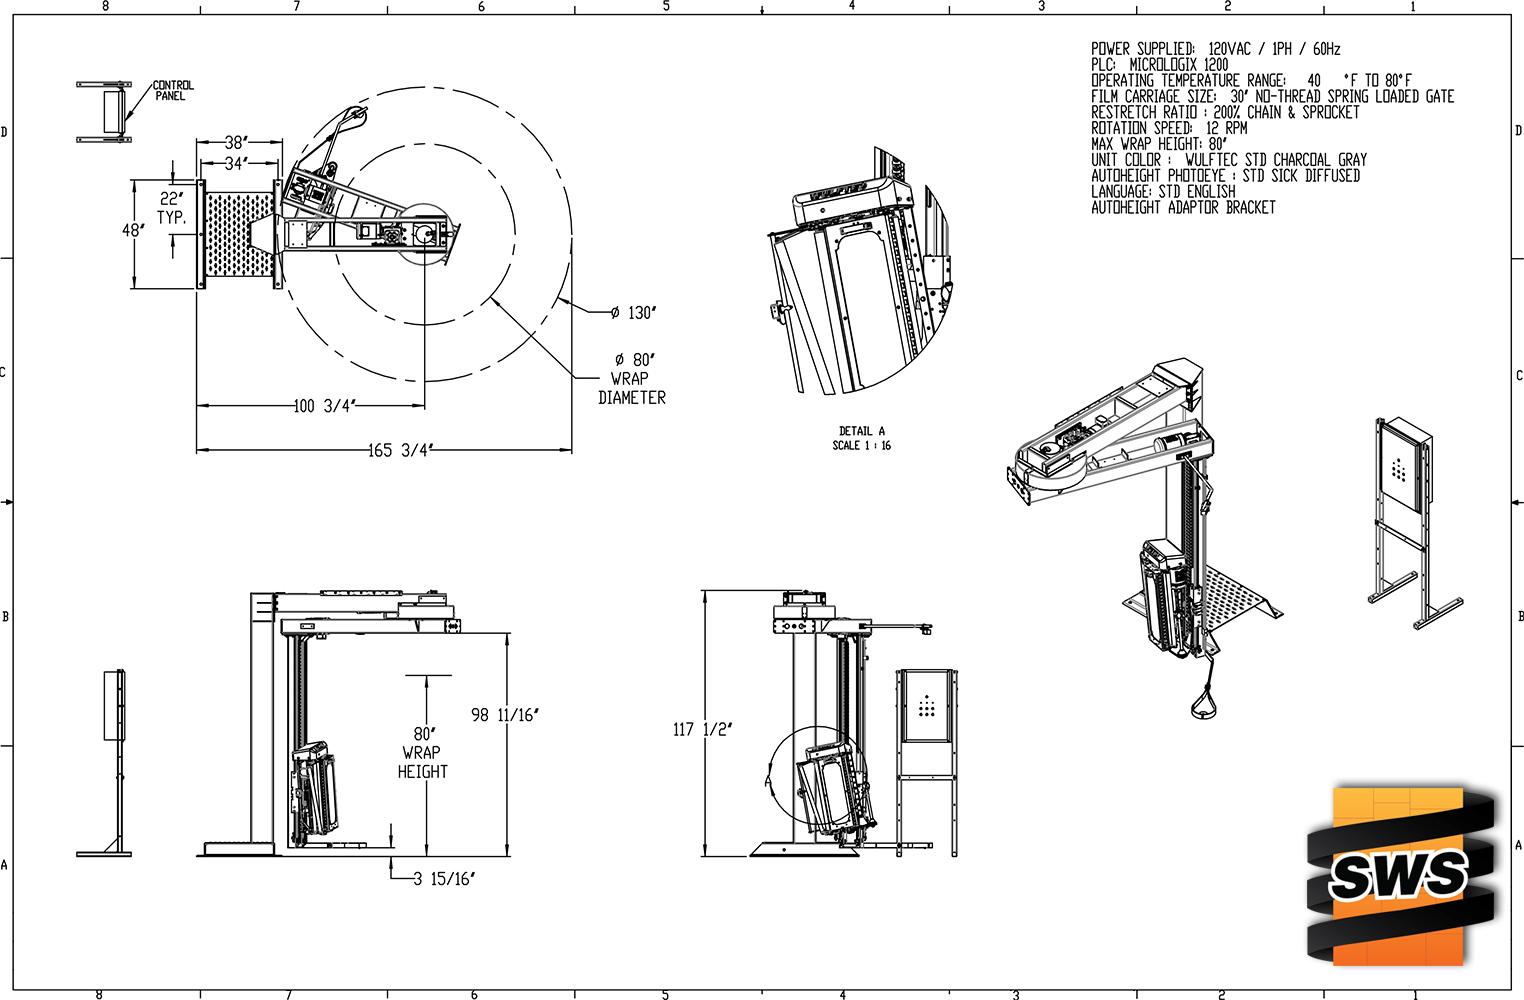 S:Work Orders in ShopSemi-auto & WRTSO134698-1 FARMERS